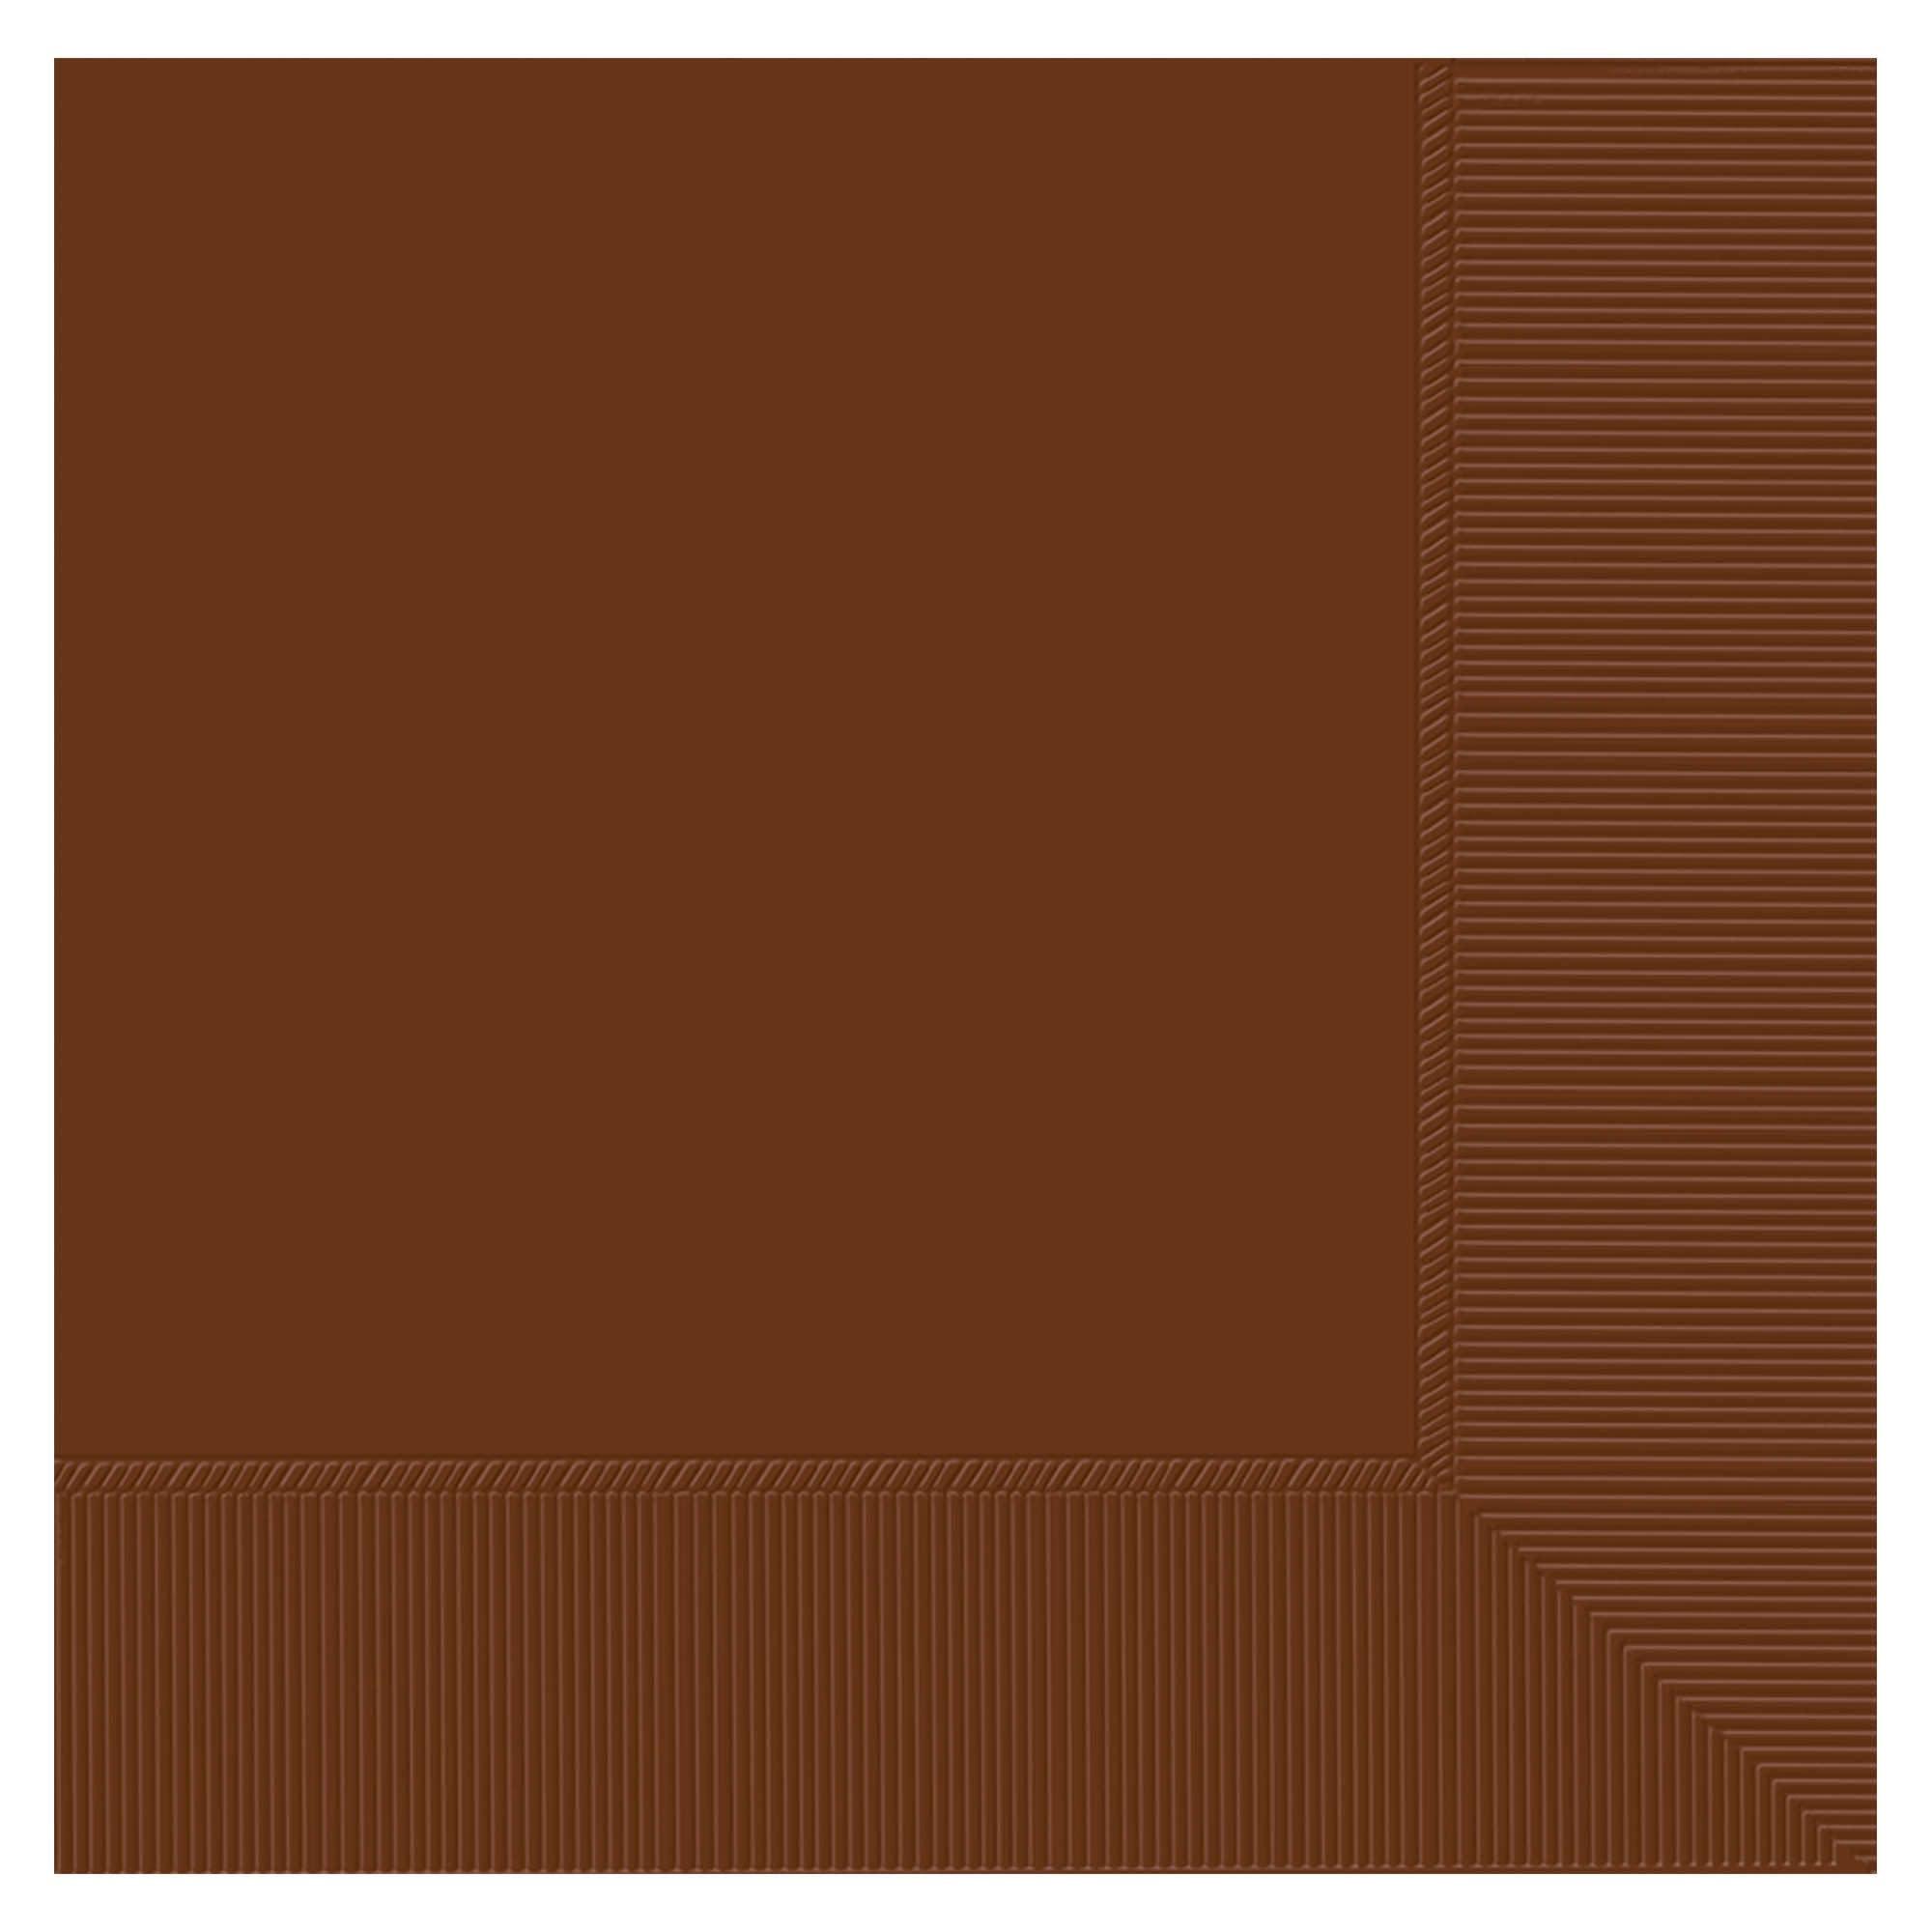 Chocolate Brown 3-Ply Dinner Napkins